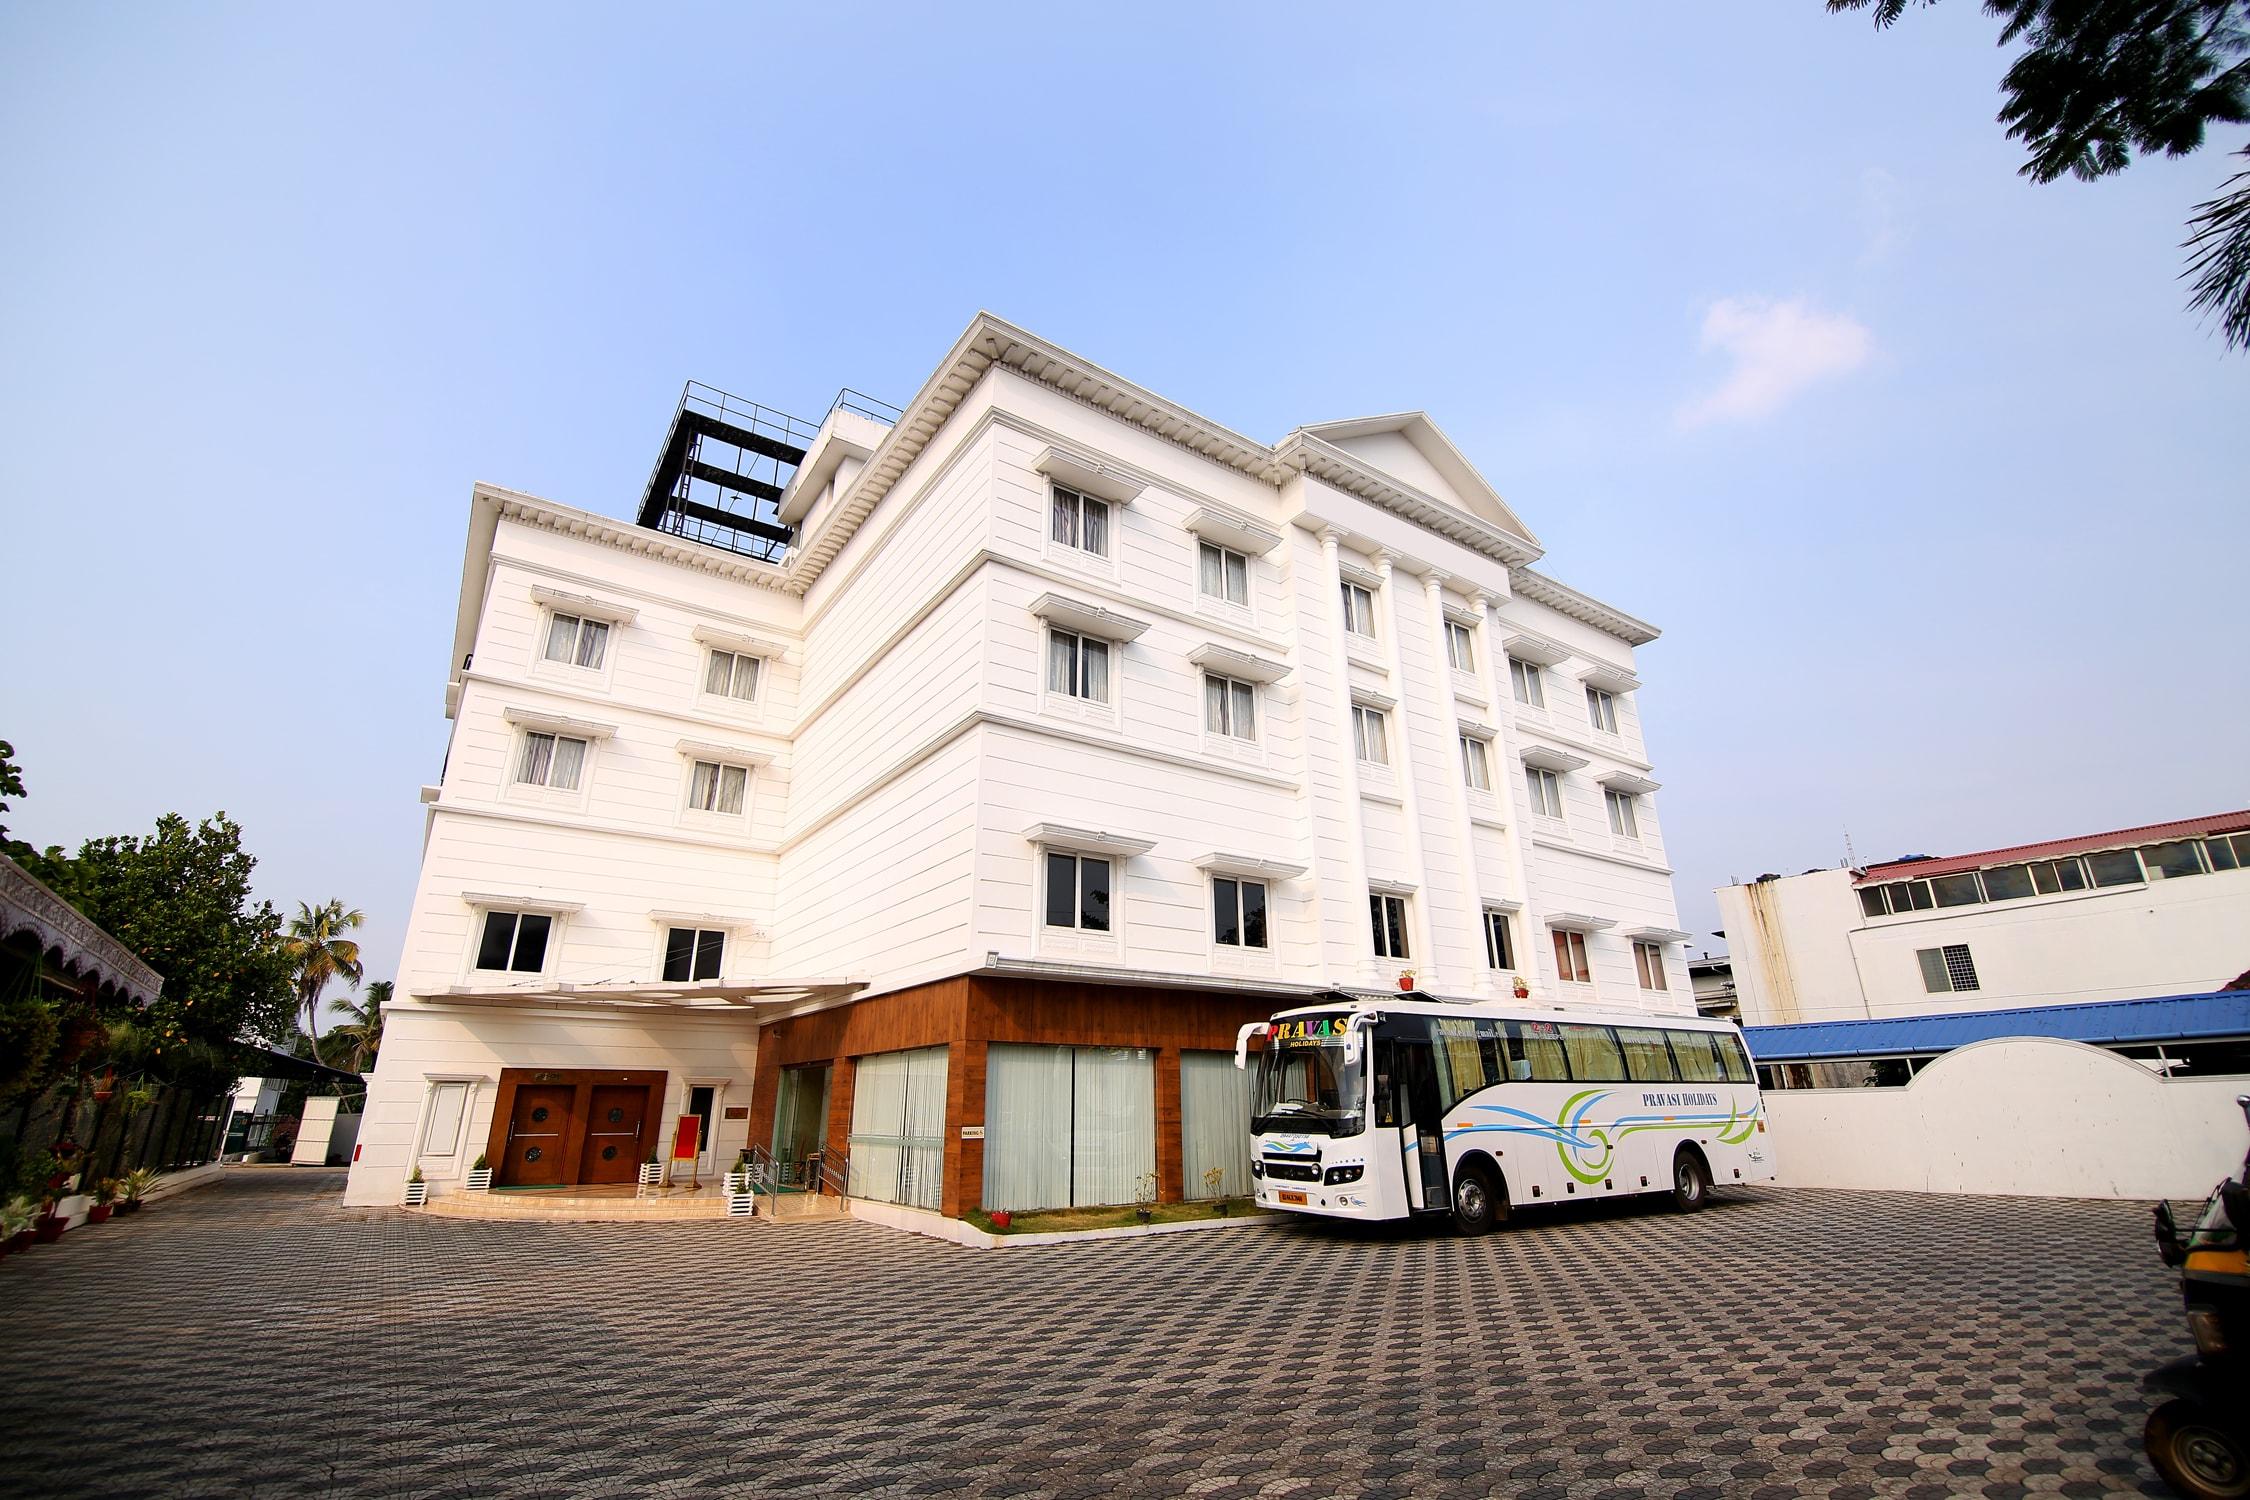 OYO 3818 Hotel Sidhartha in Kizhake Chalakudi